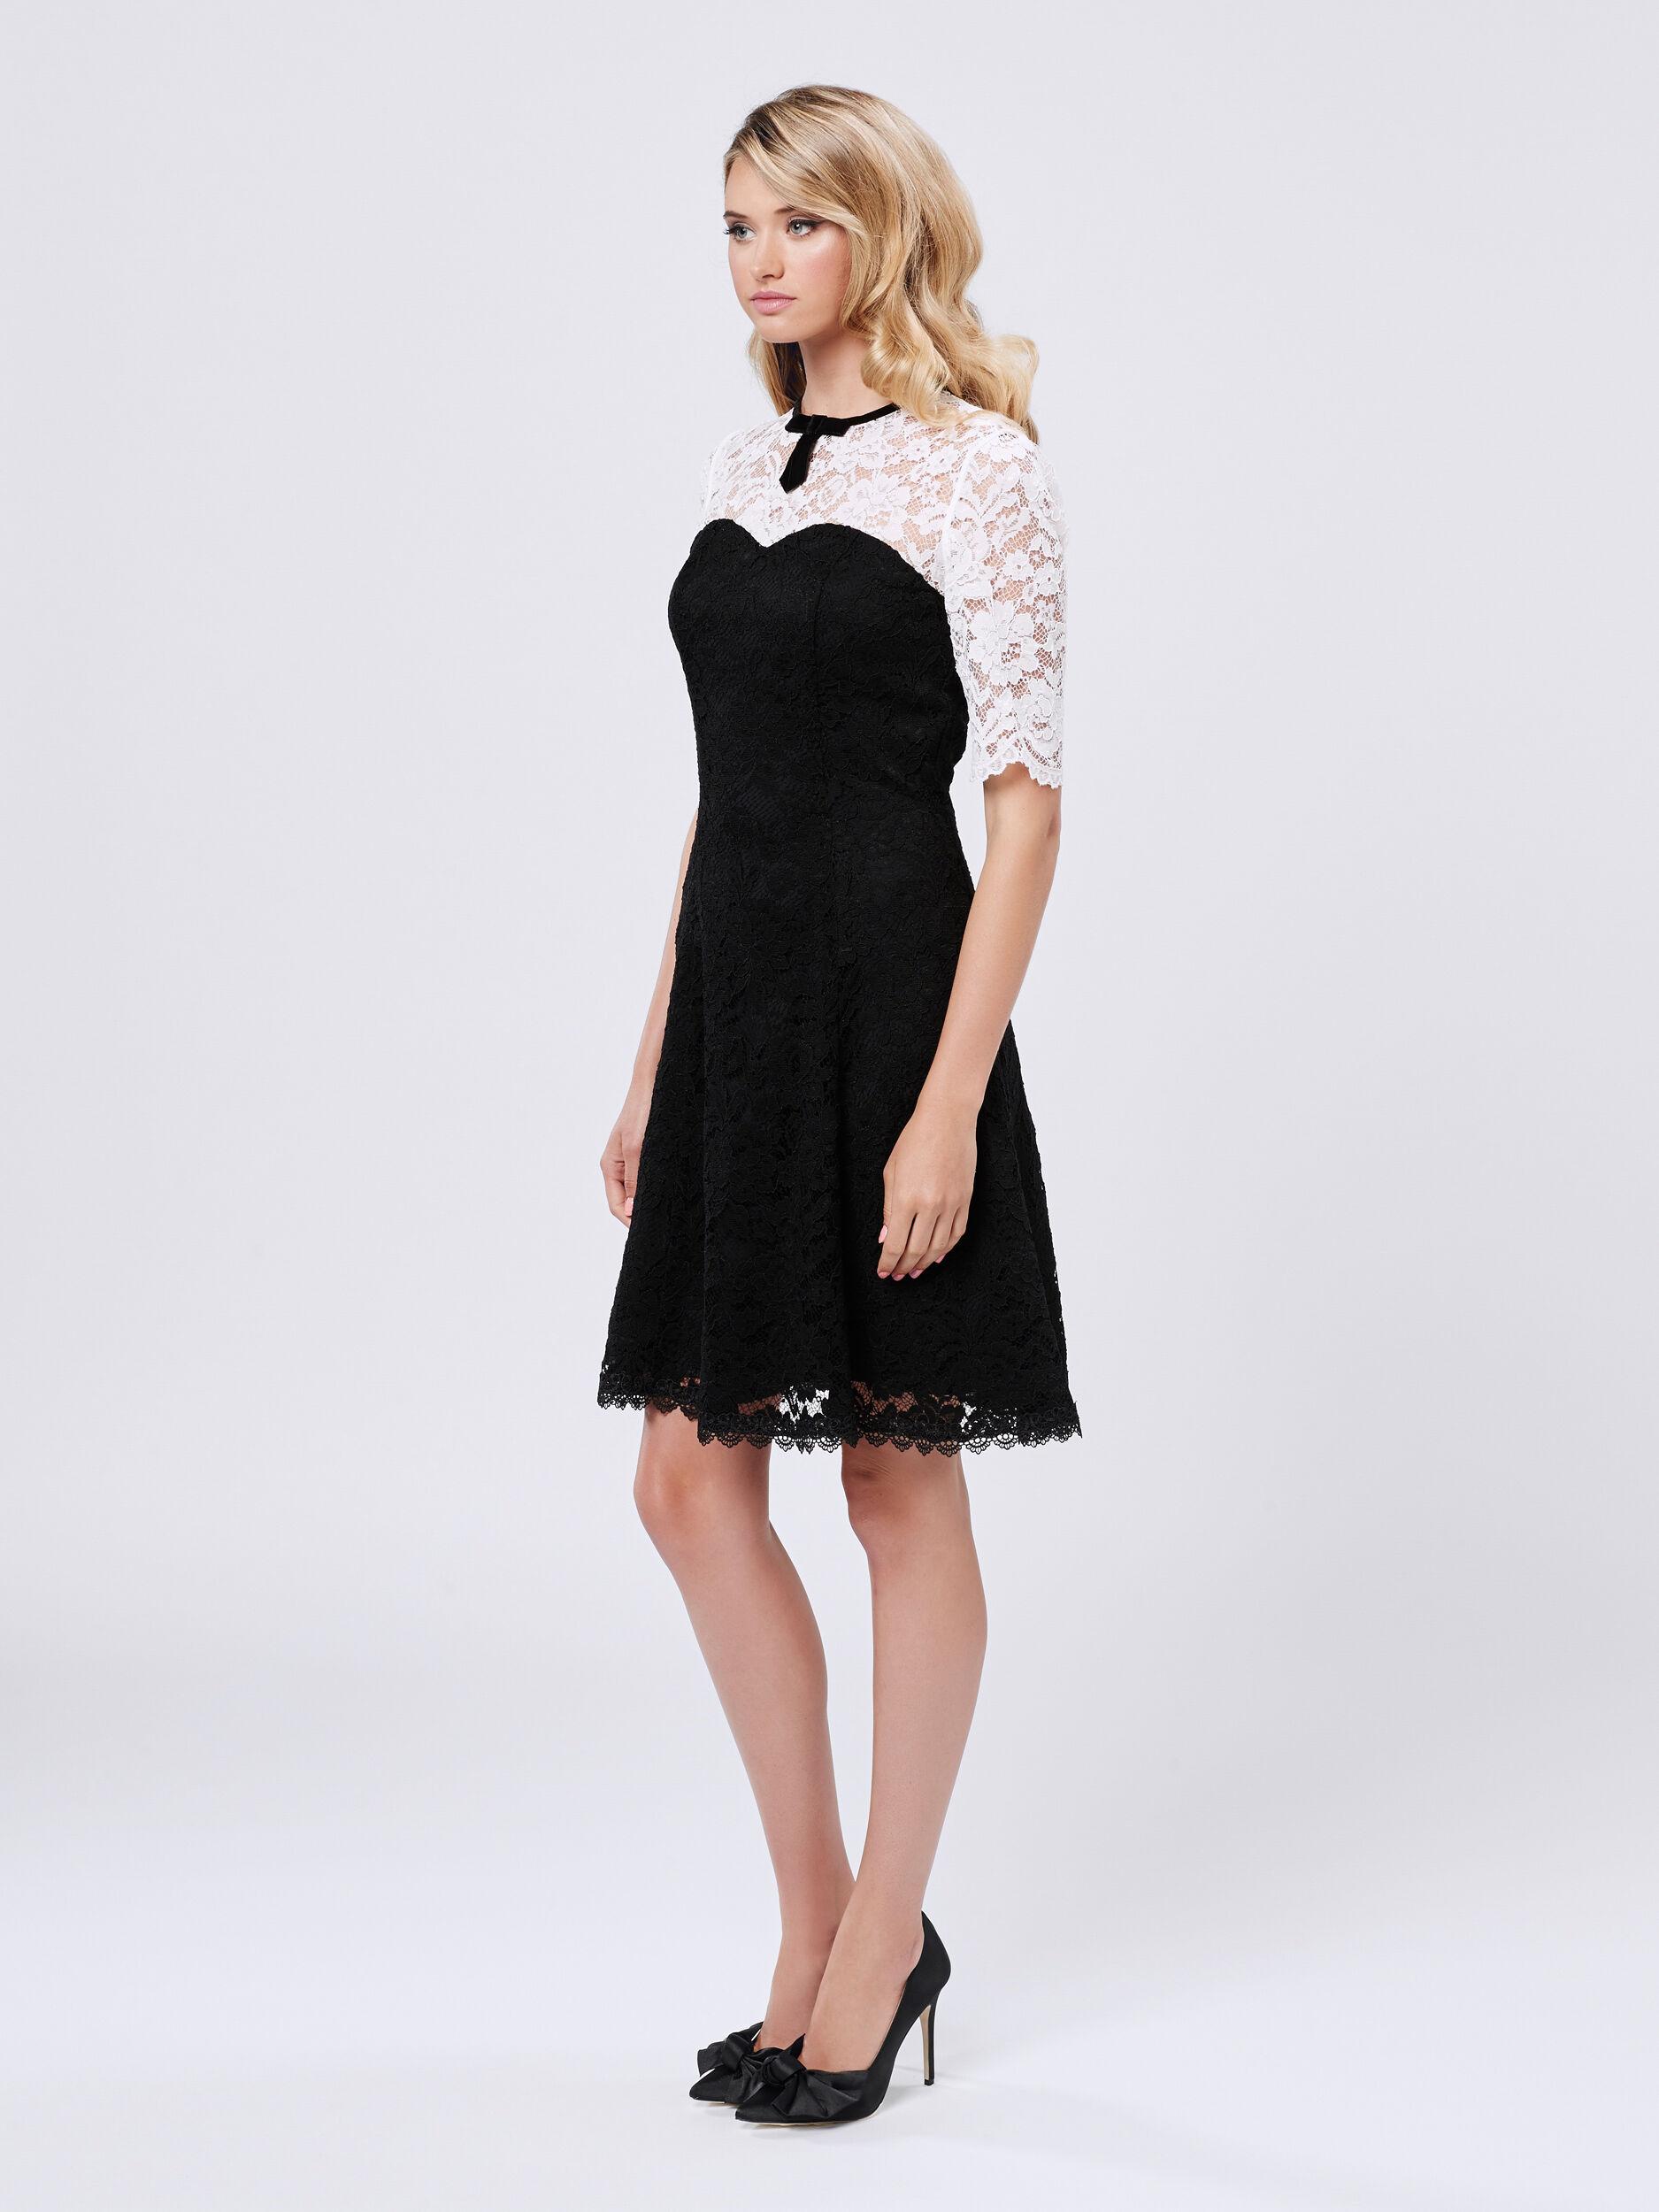 563904a3a51 Black Tie Dress